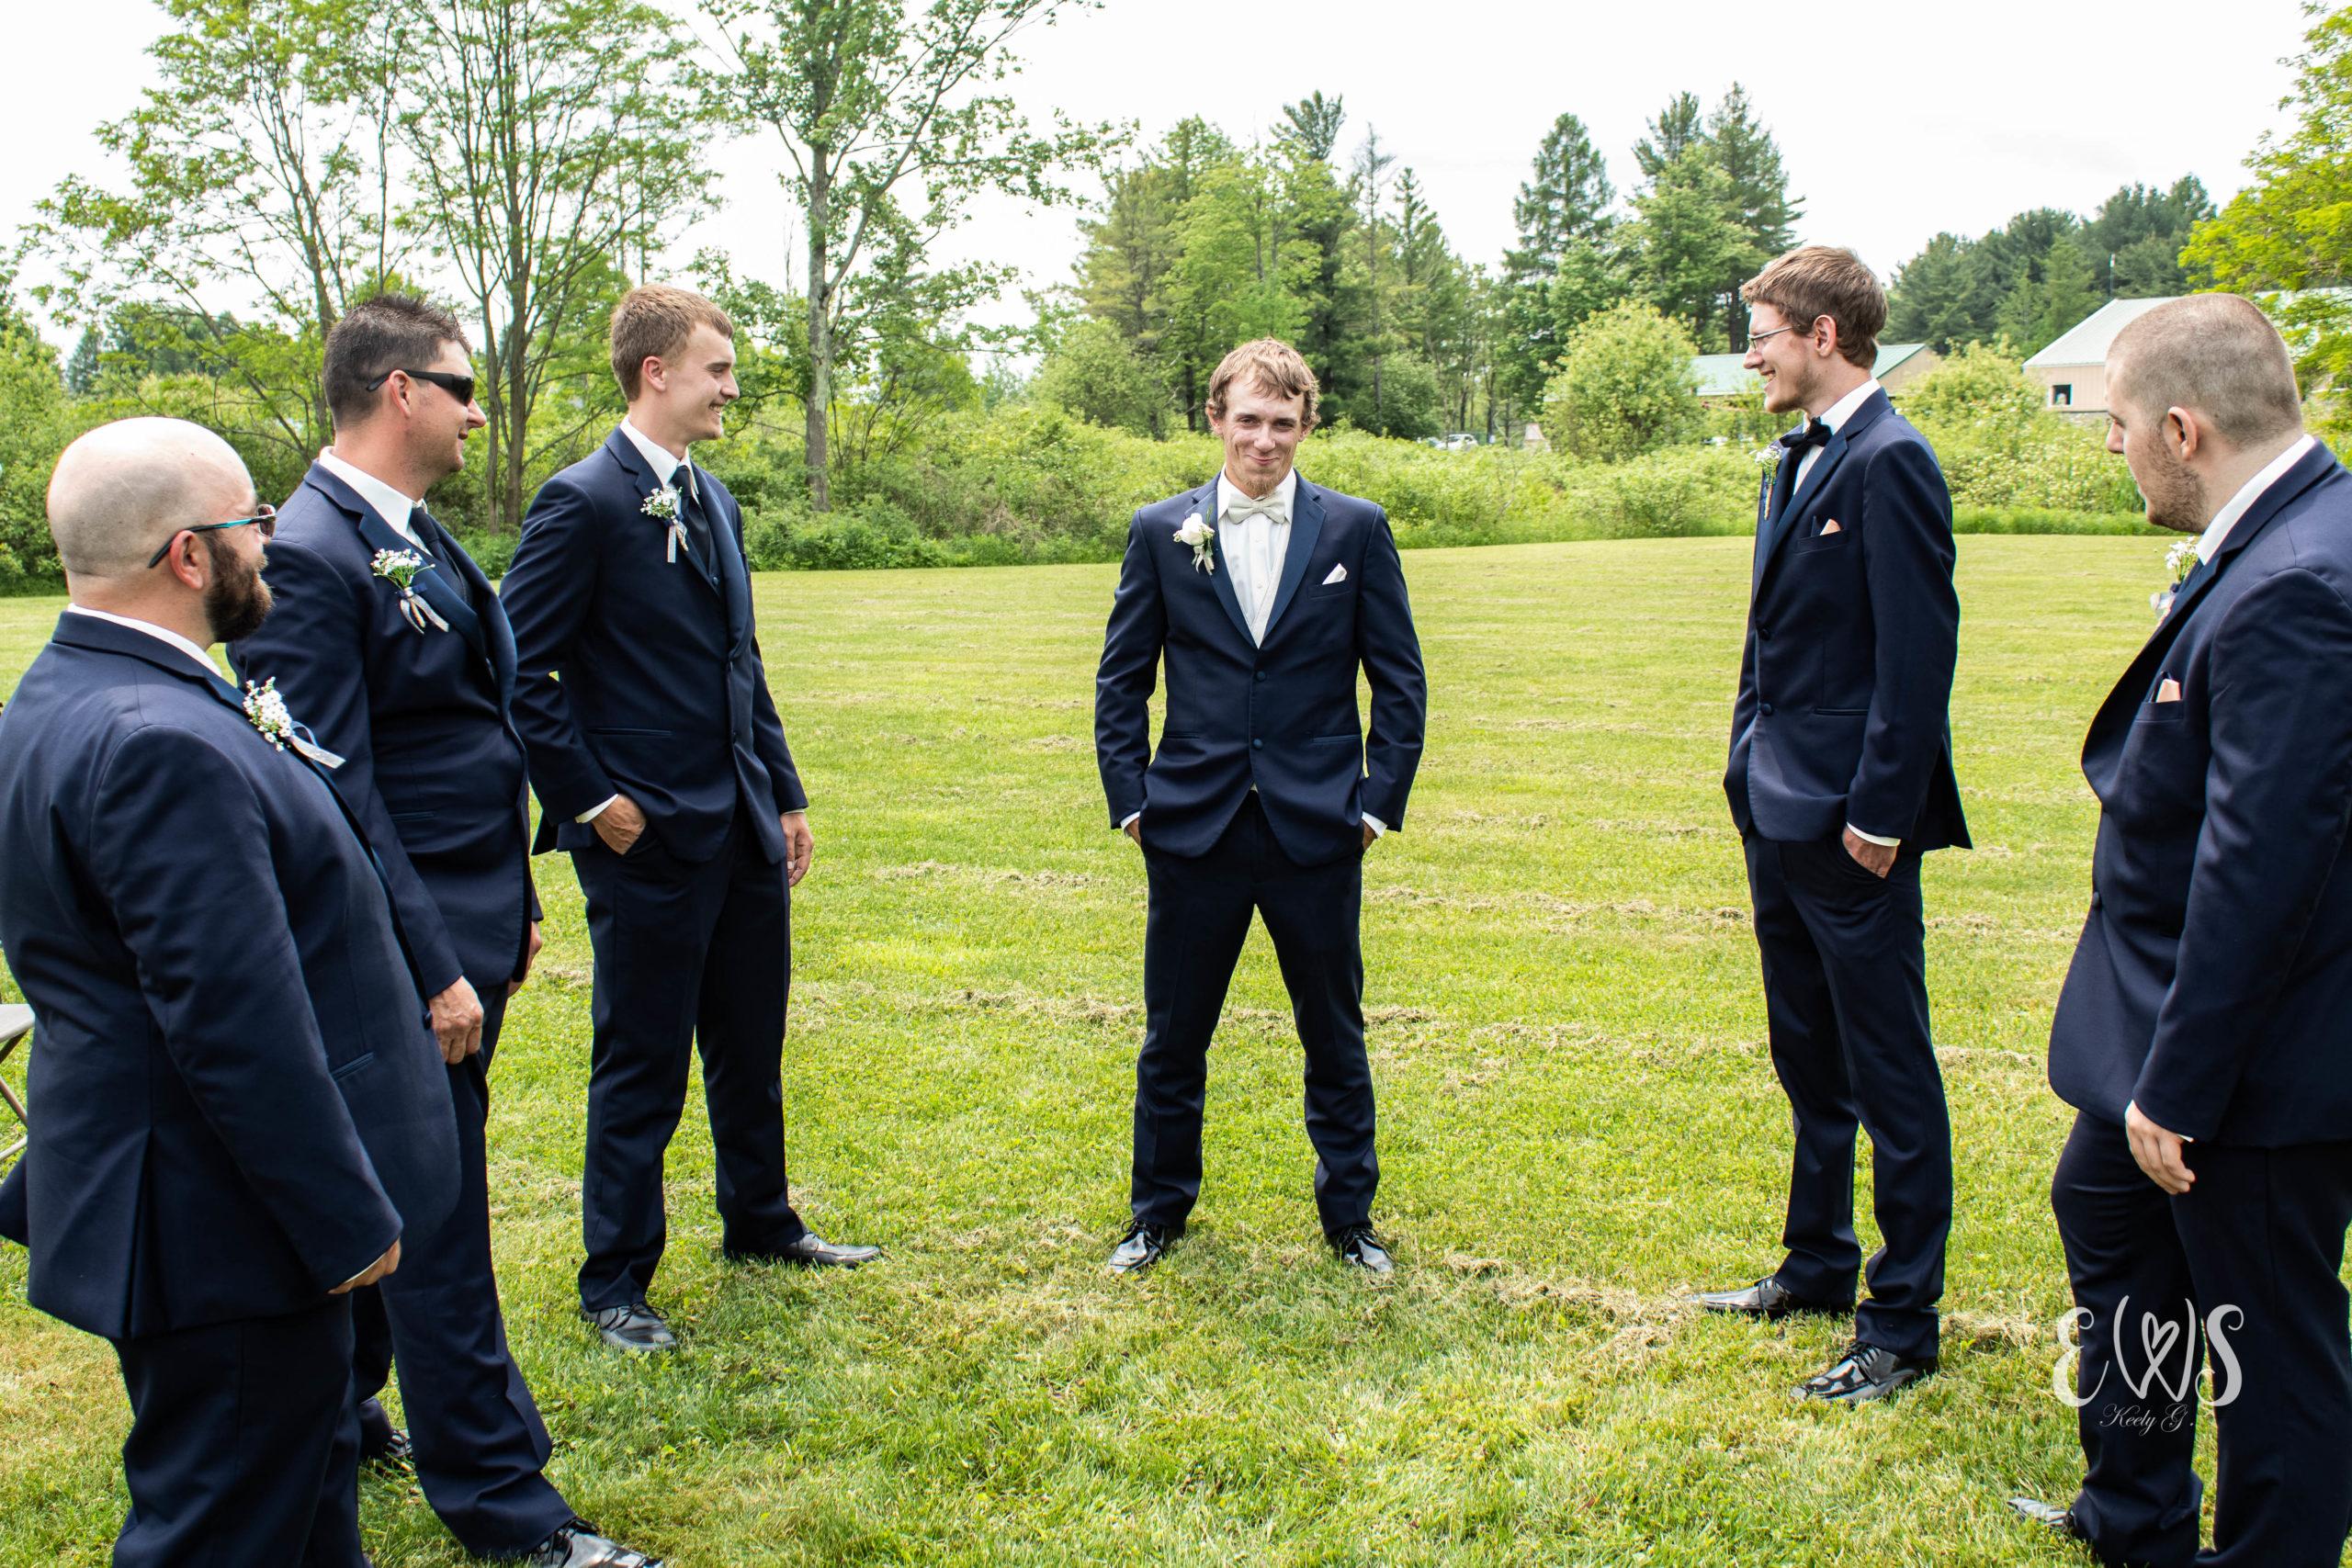 Summer Wedding Groomsmen